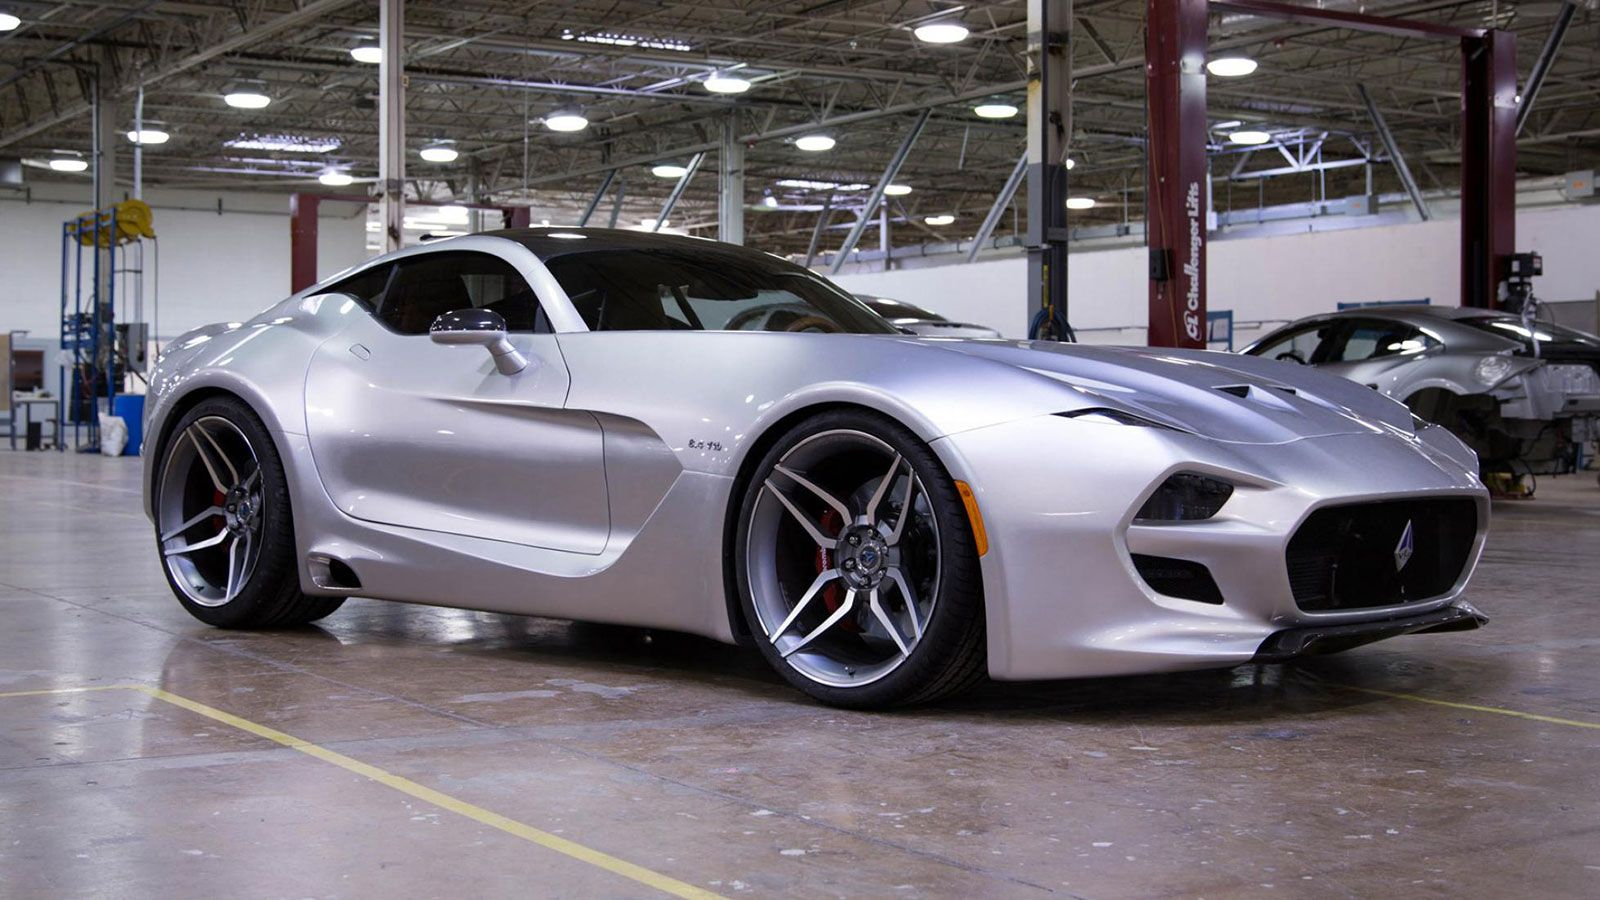 VLF AUTOMOTIVE FORCE 1 ANNOUNCED IN DETROIT   Detroit, Super car and ...